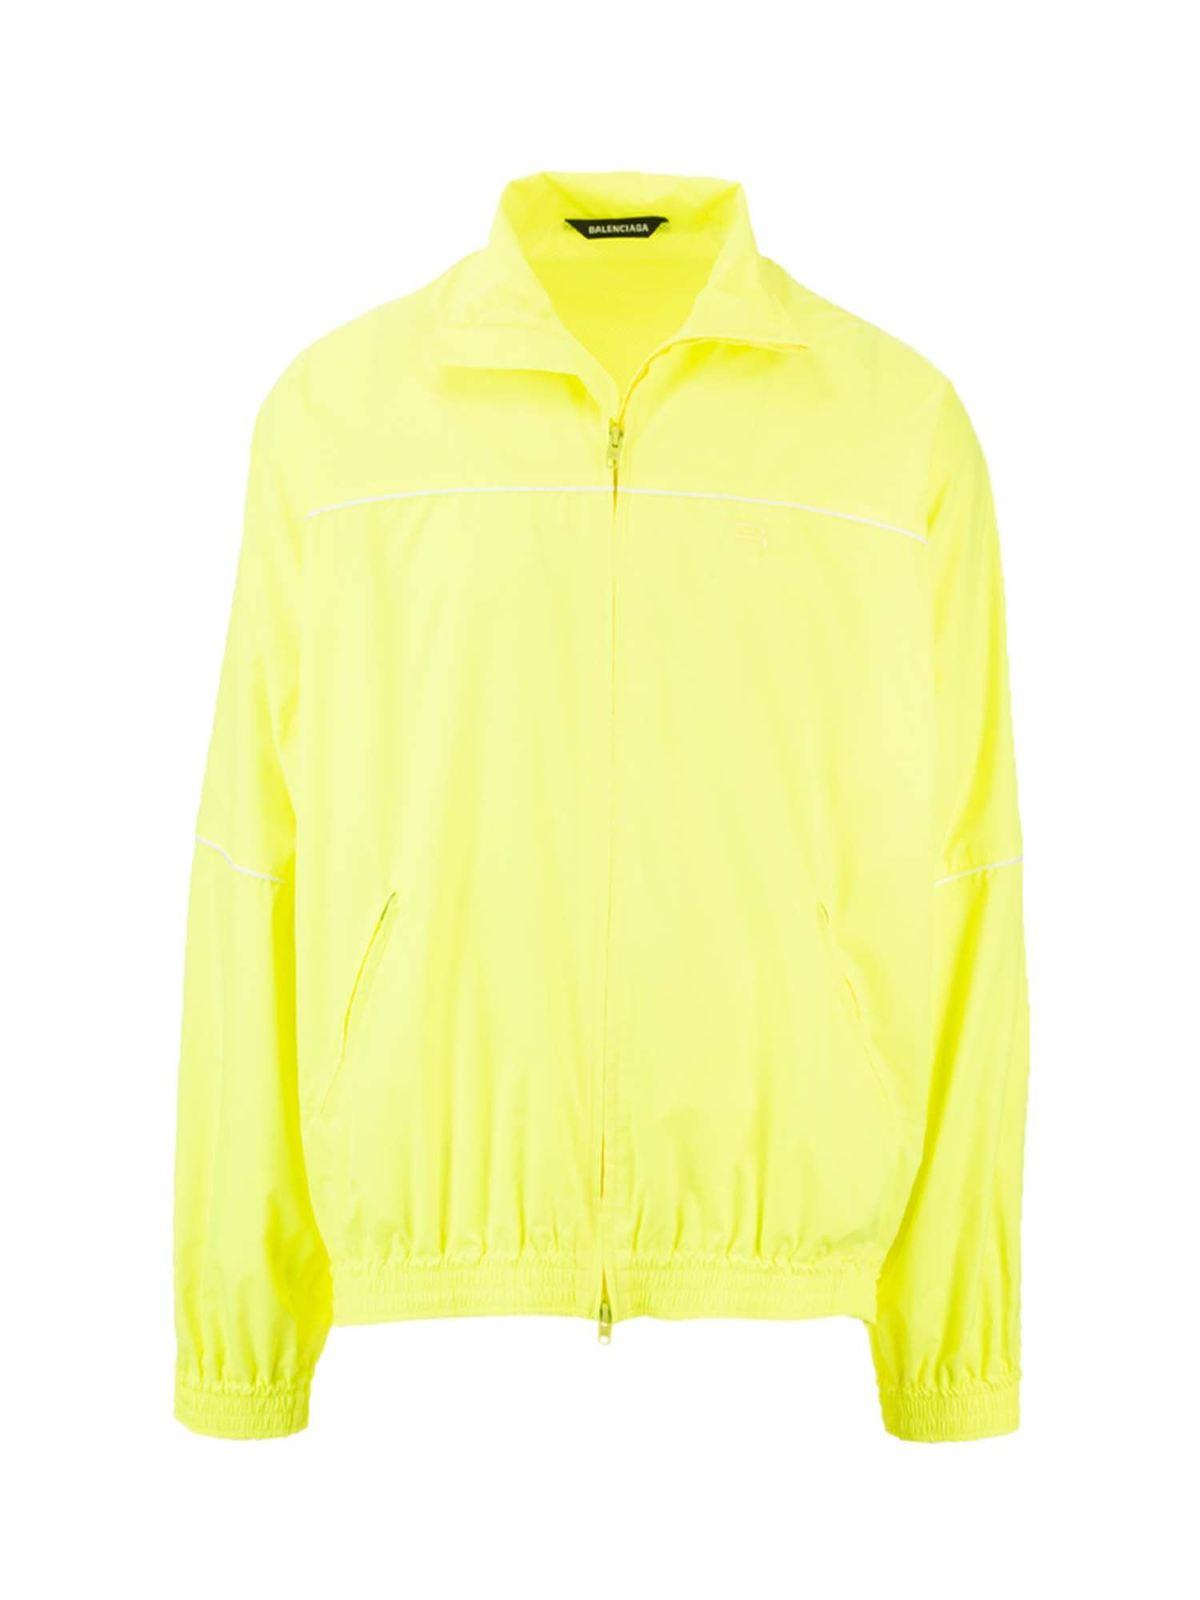 Balenciaga Jackets TRACKSUIT JACKET IN FLUO YELLOW